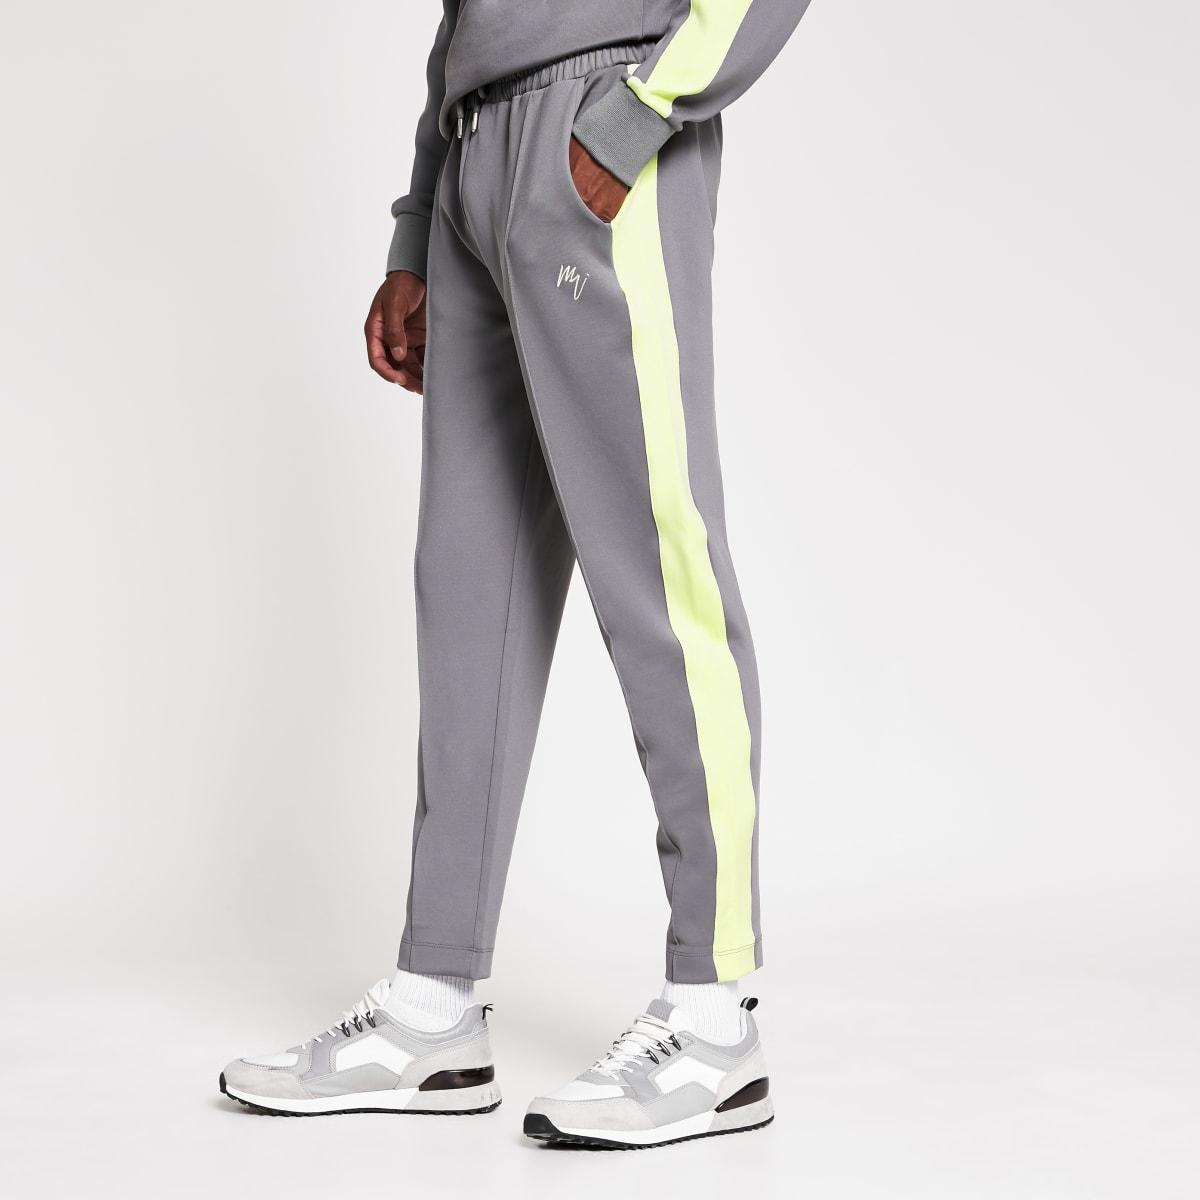 MaisonRiviera- Grijze slim-fit joggingbroek